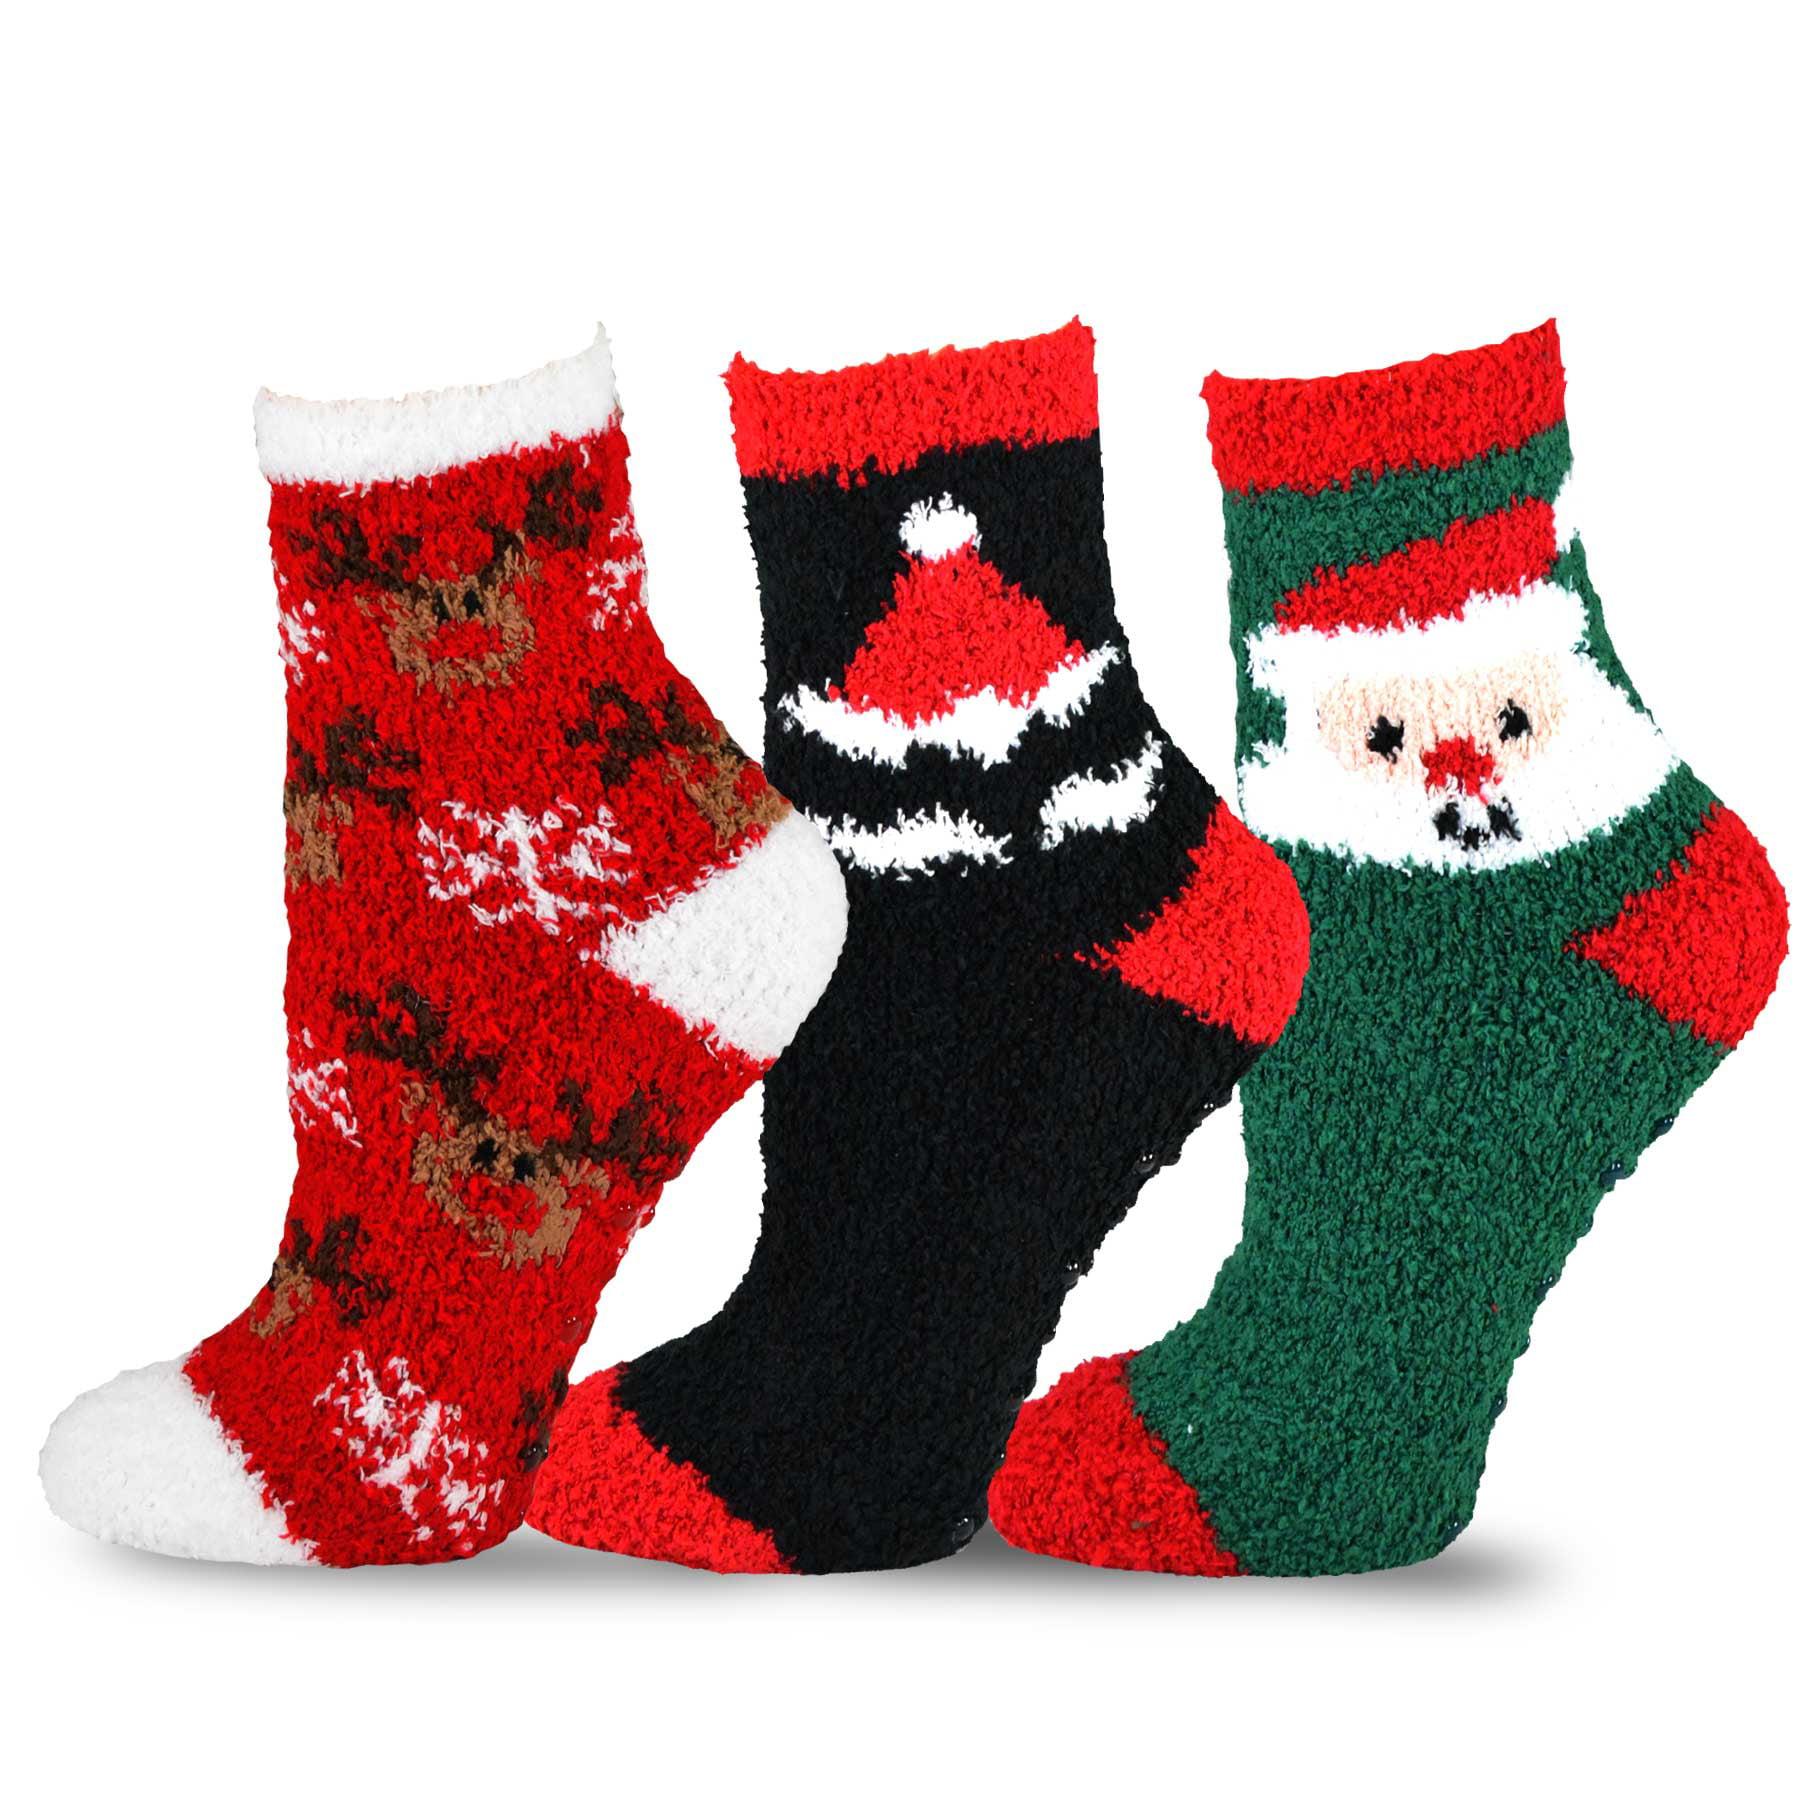 New Babies Unisex Cute Christmas Socks Newborn Socks Kids Children  Xmas Novelty